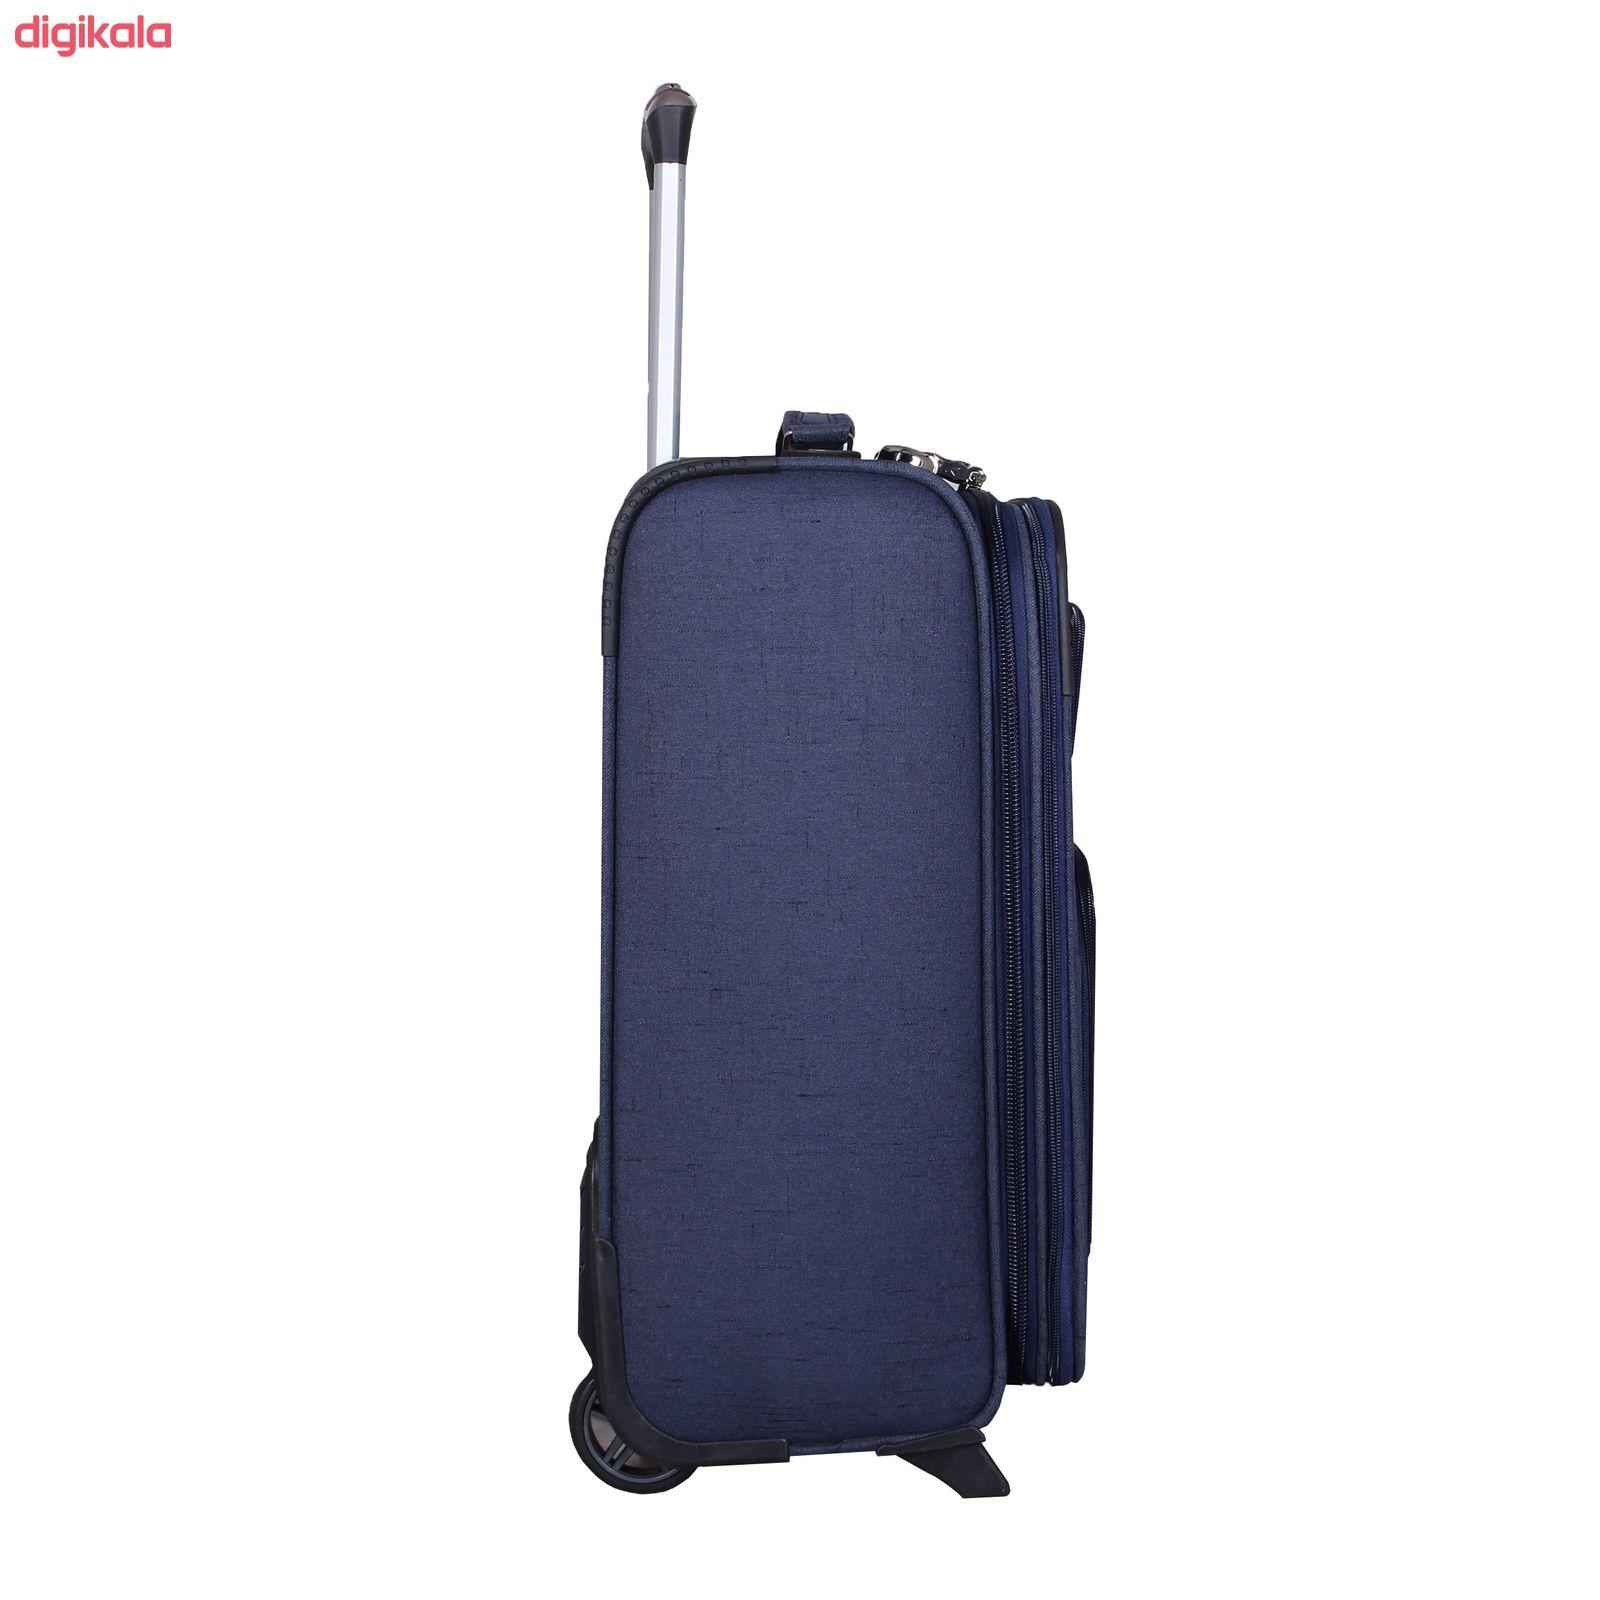 مجموعه سه عددی چمدان کد 2301A main 1 11